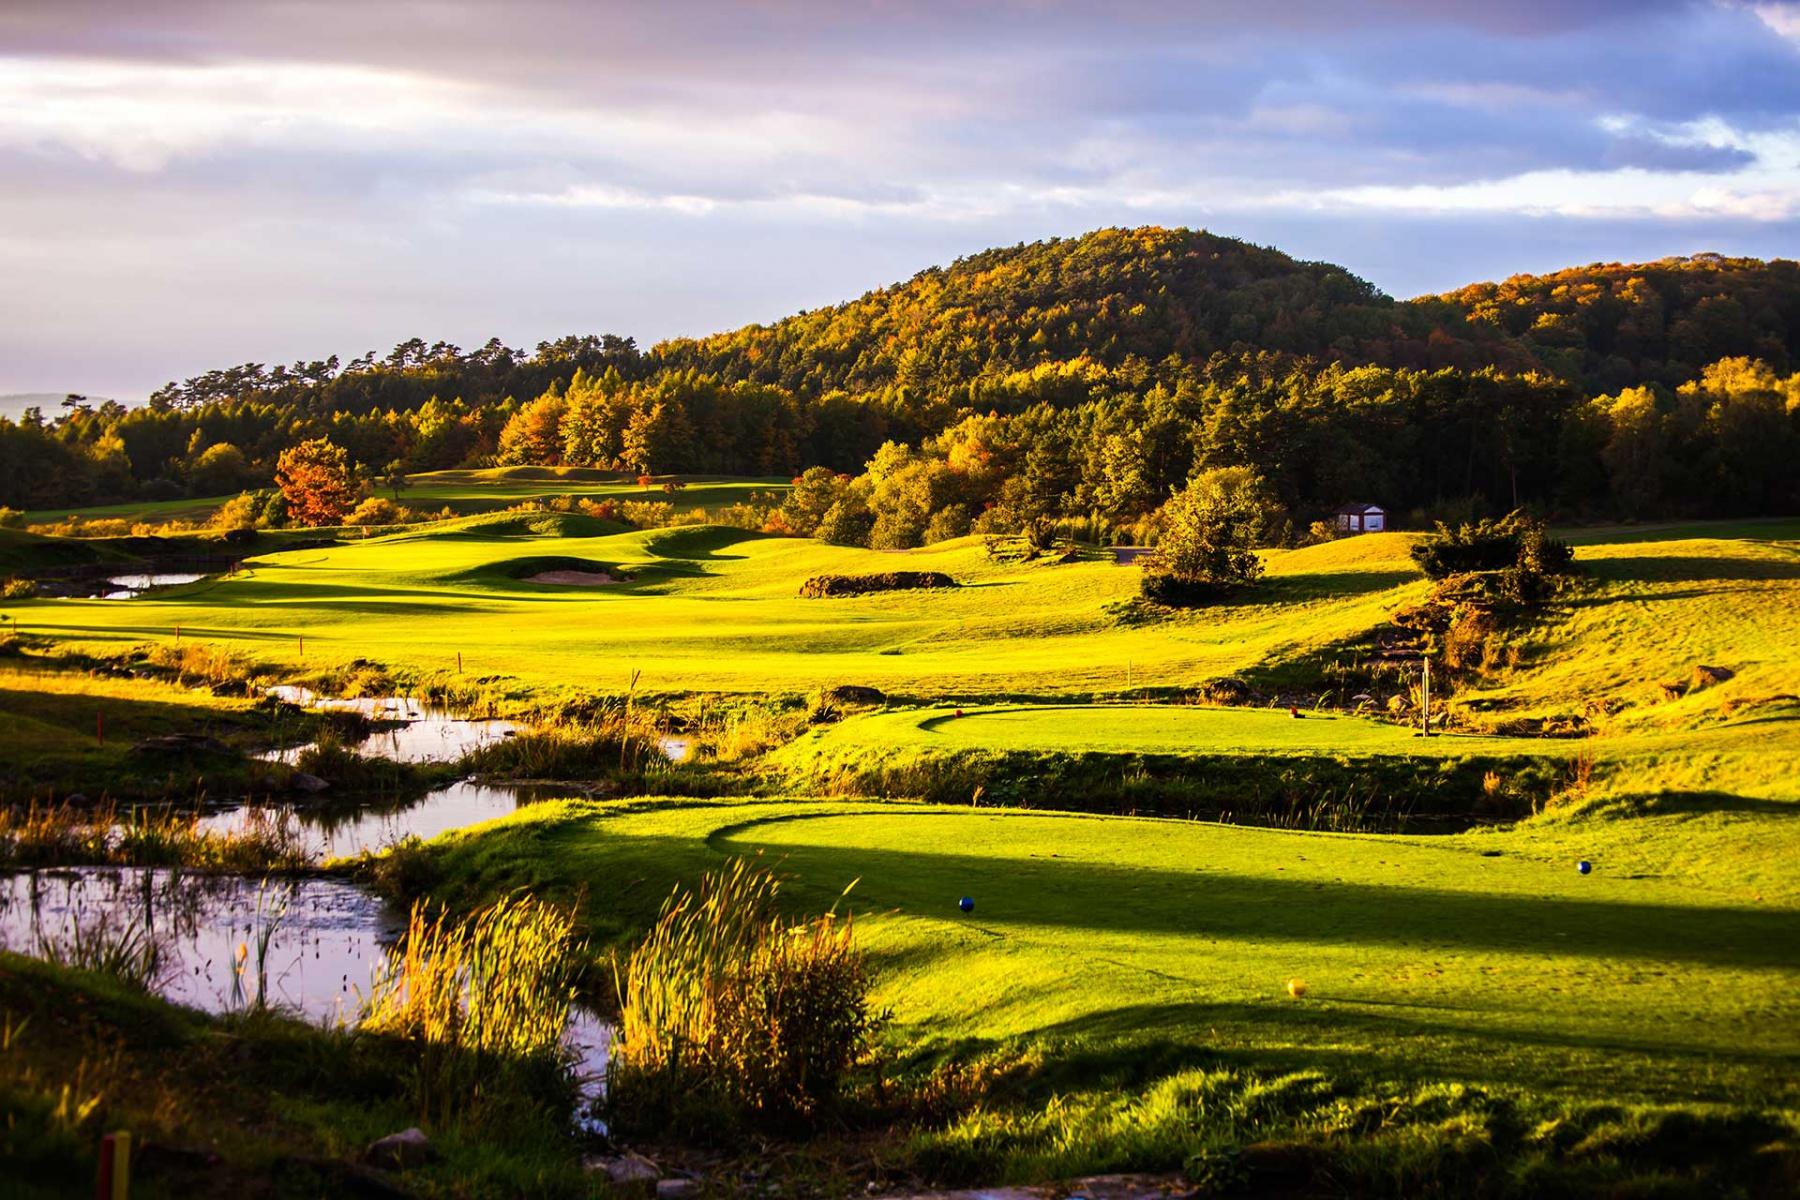 national golf resort klaipėda